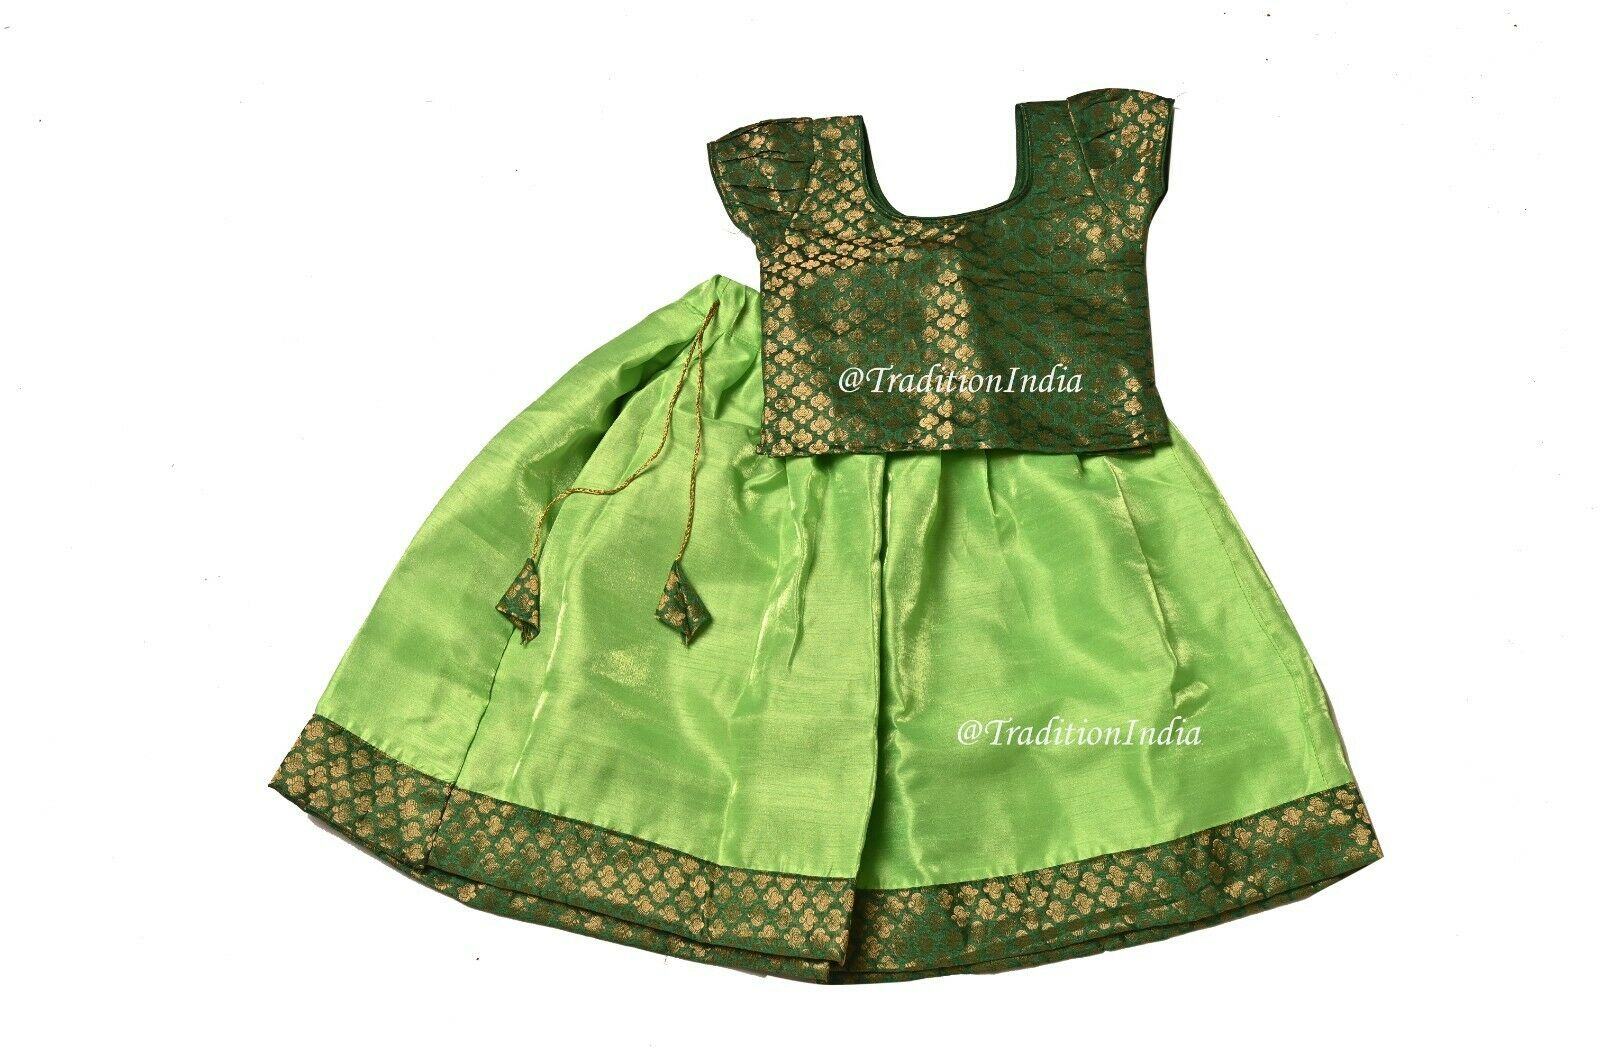 South Indian Pavadai, Readymade Kids Dress, Festive Wear, Baby Girl Lehenga